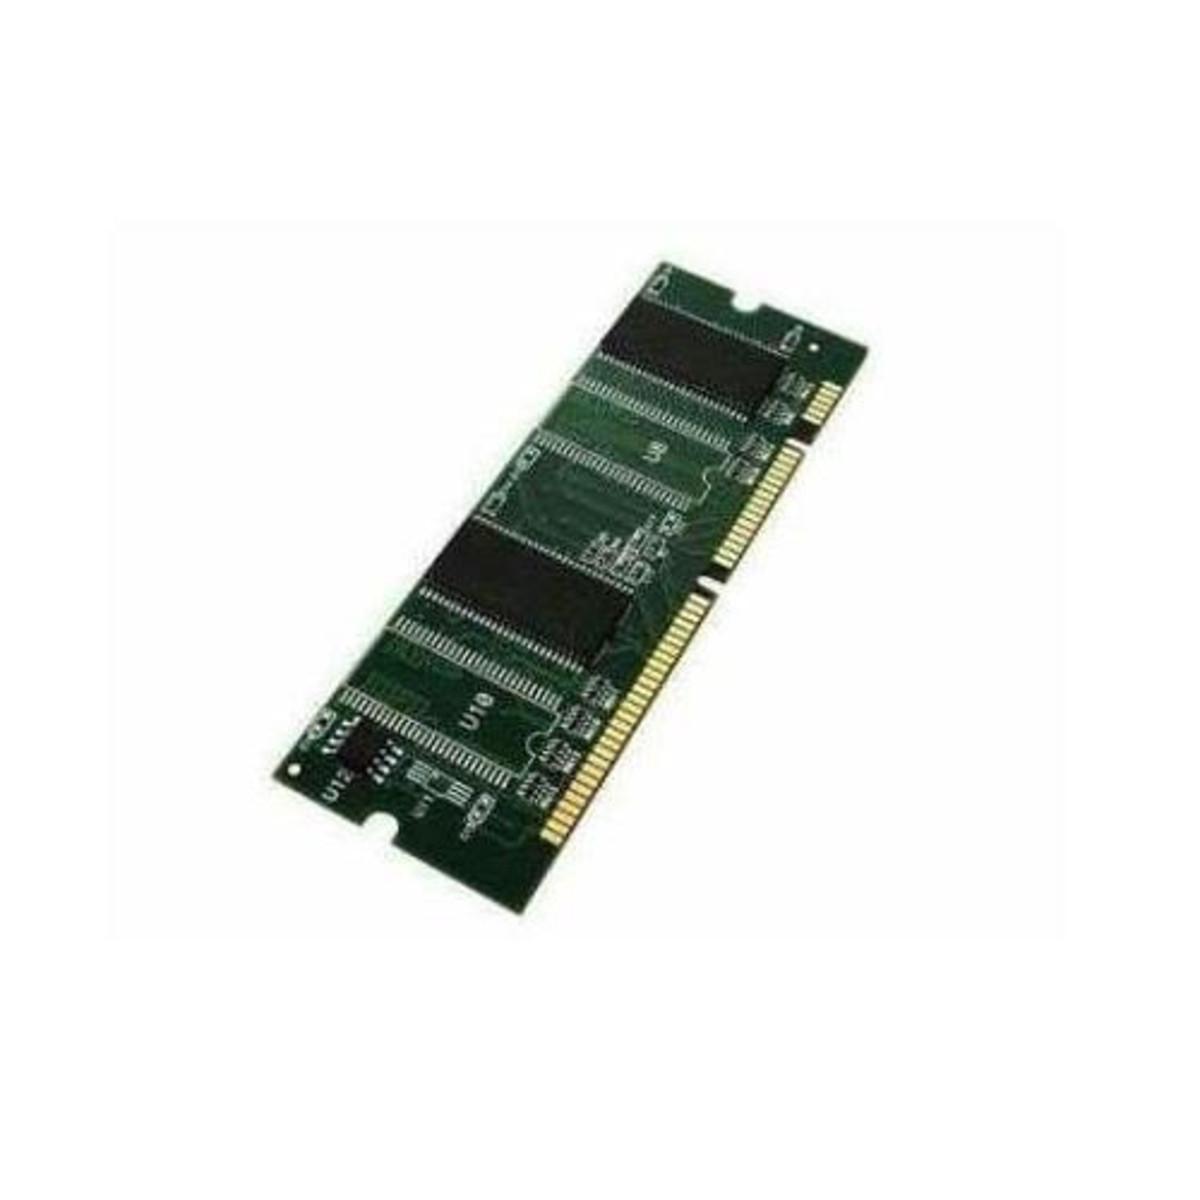 Xerox 256MB Phaser Memory